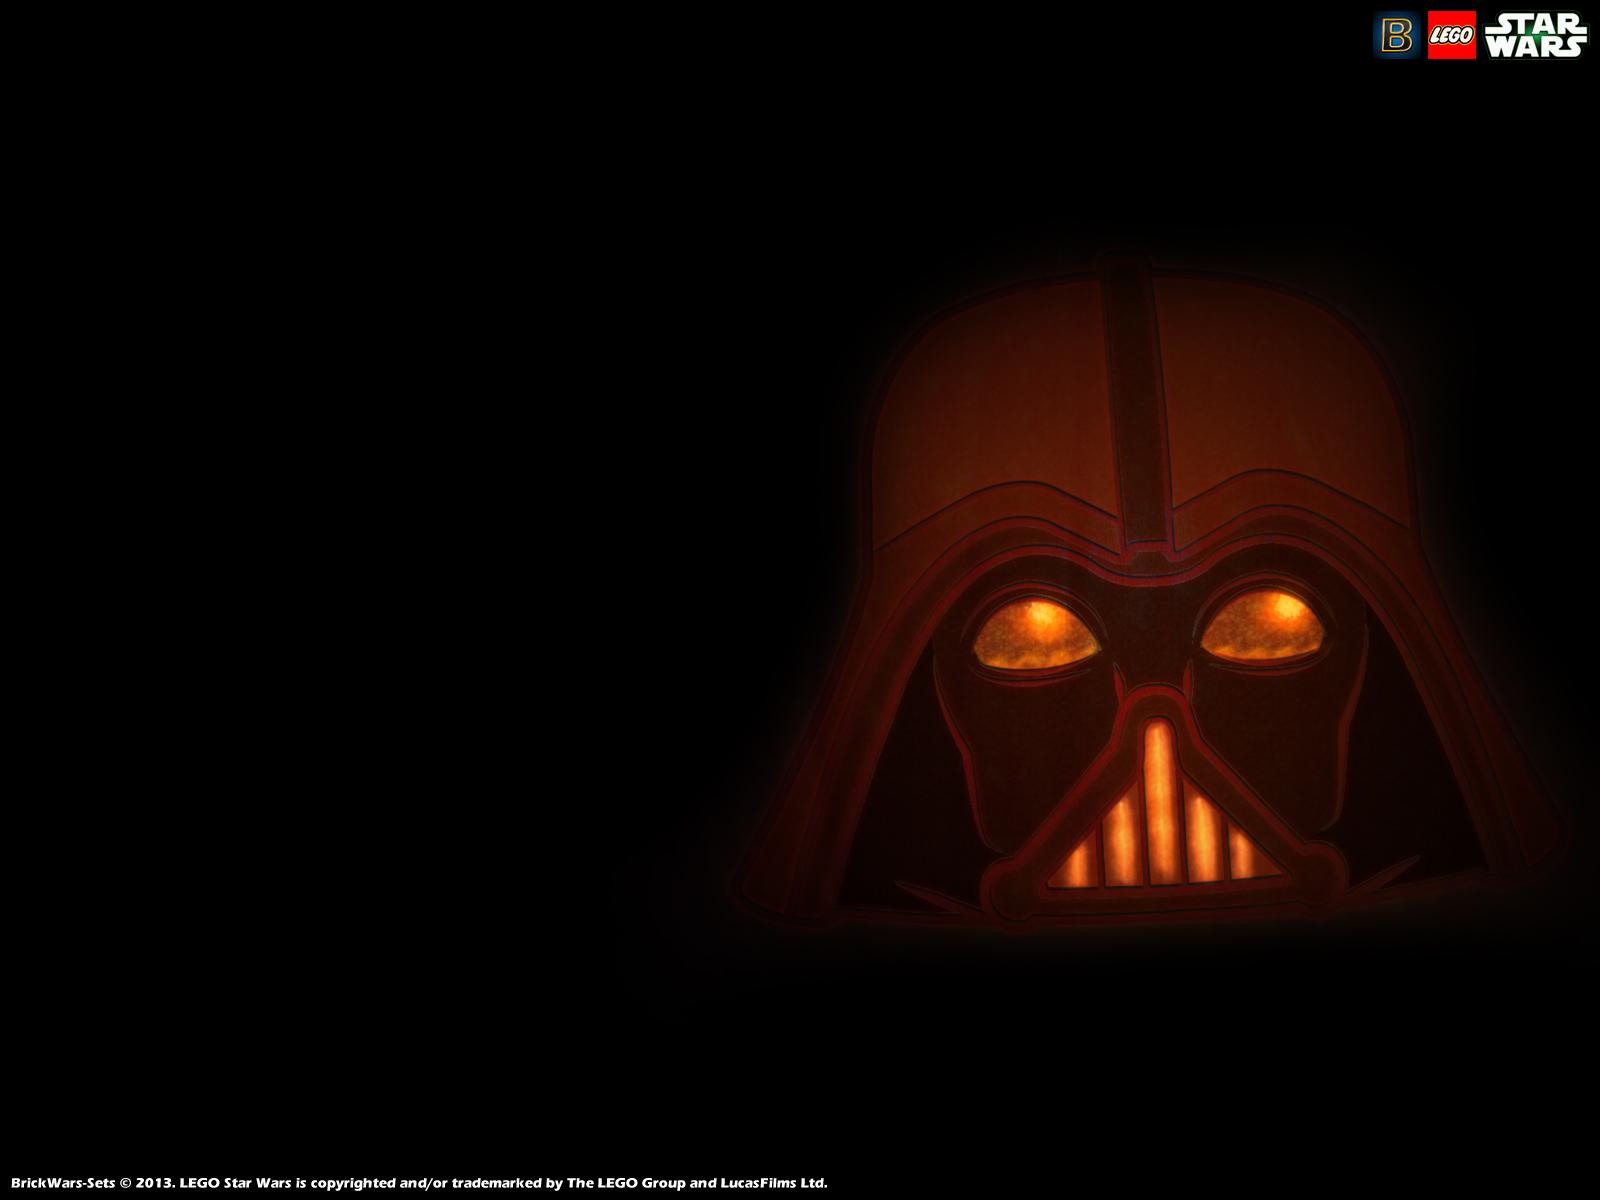 Amazing Wallpaper Halloween Star Wars - halloween_2013_vader  Photograph_65341.jpg